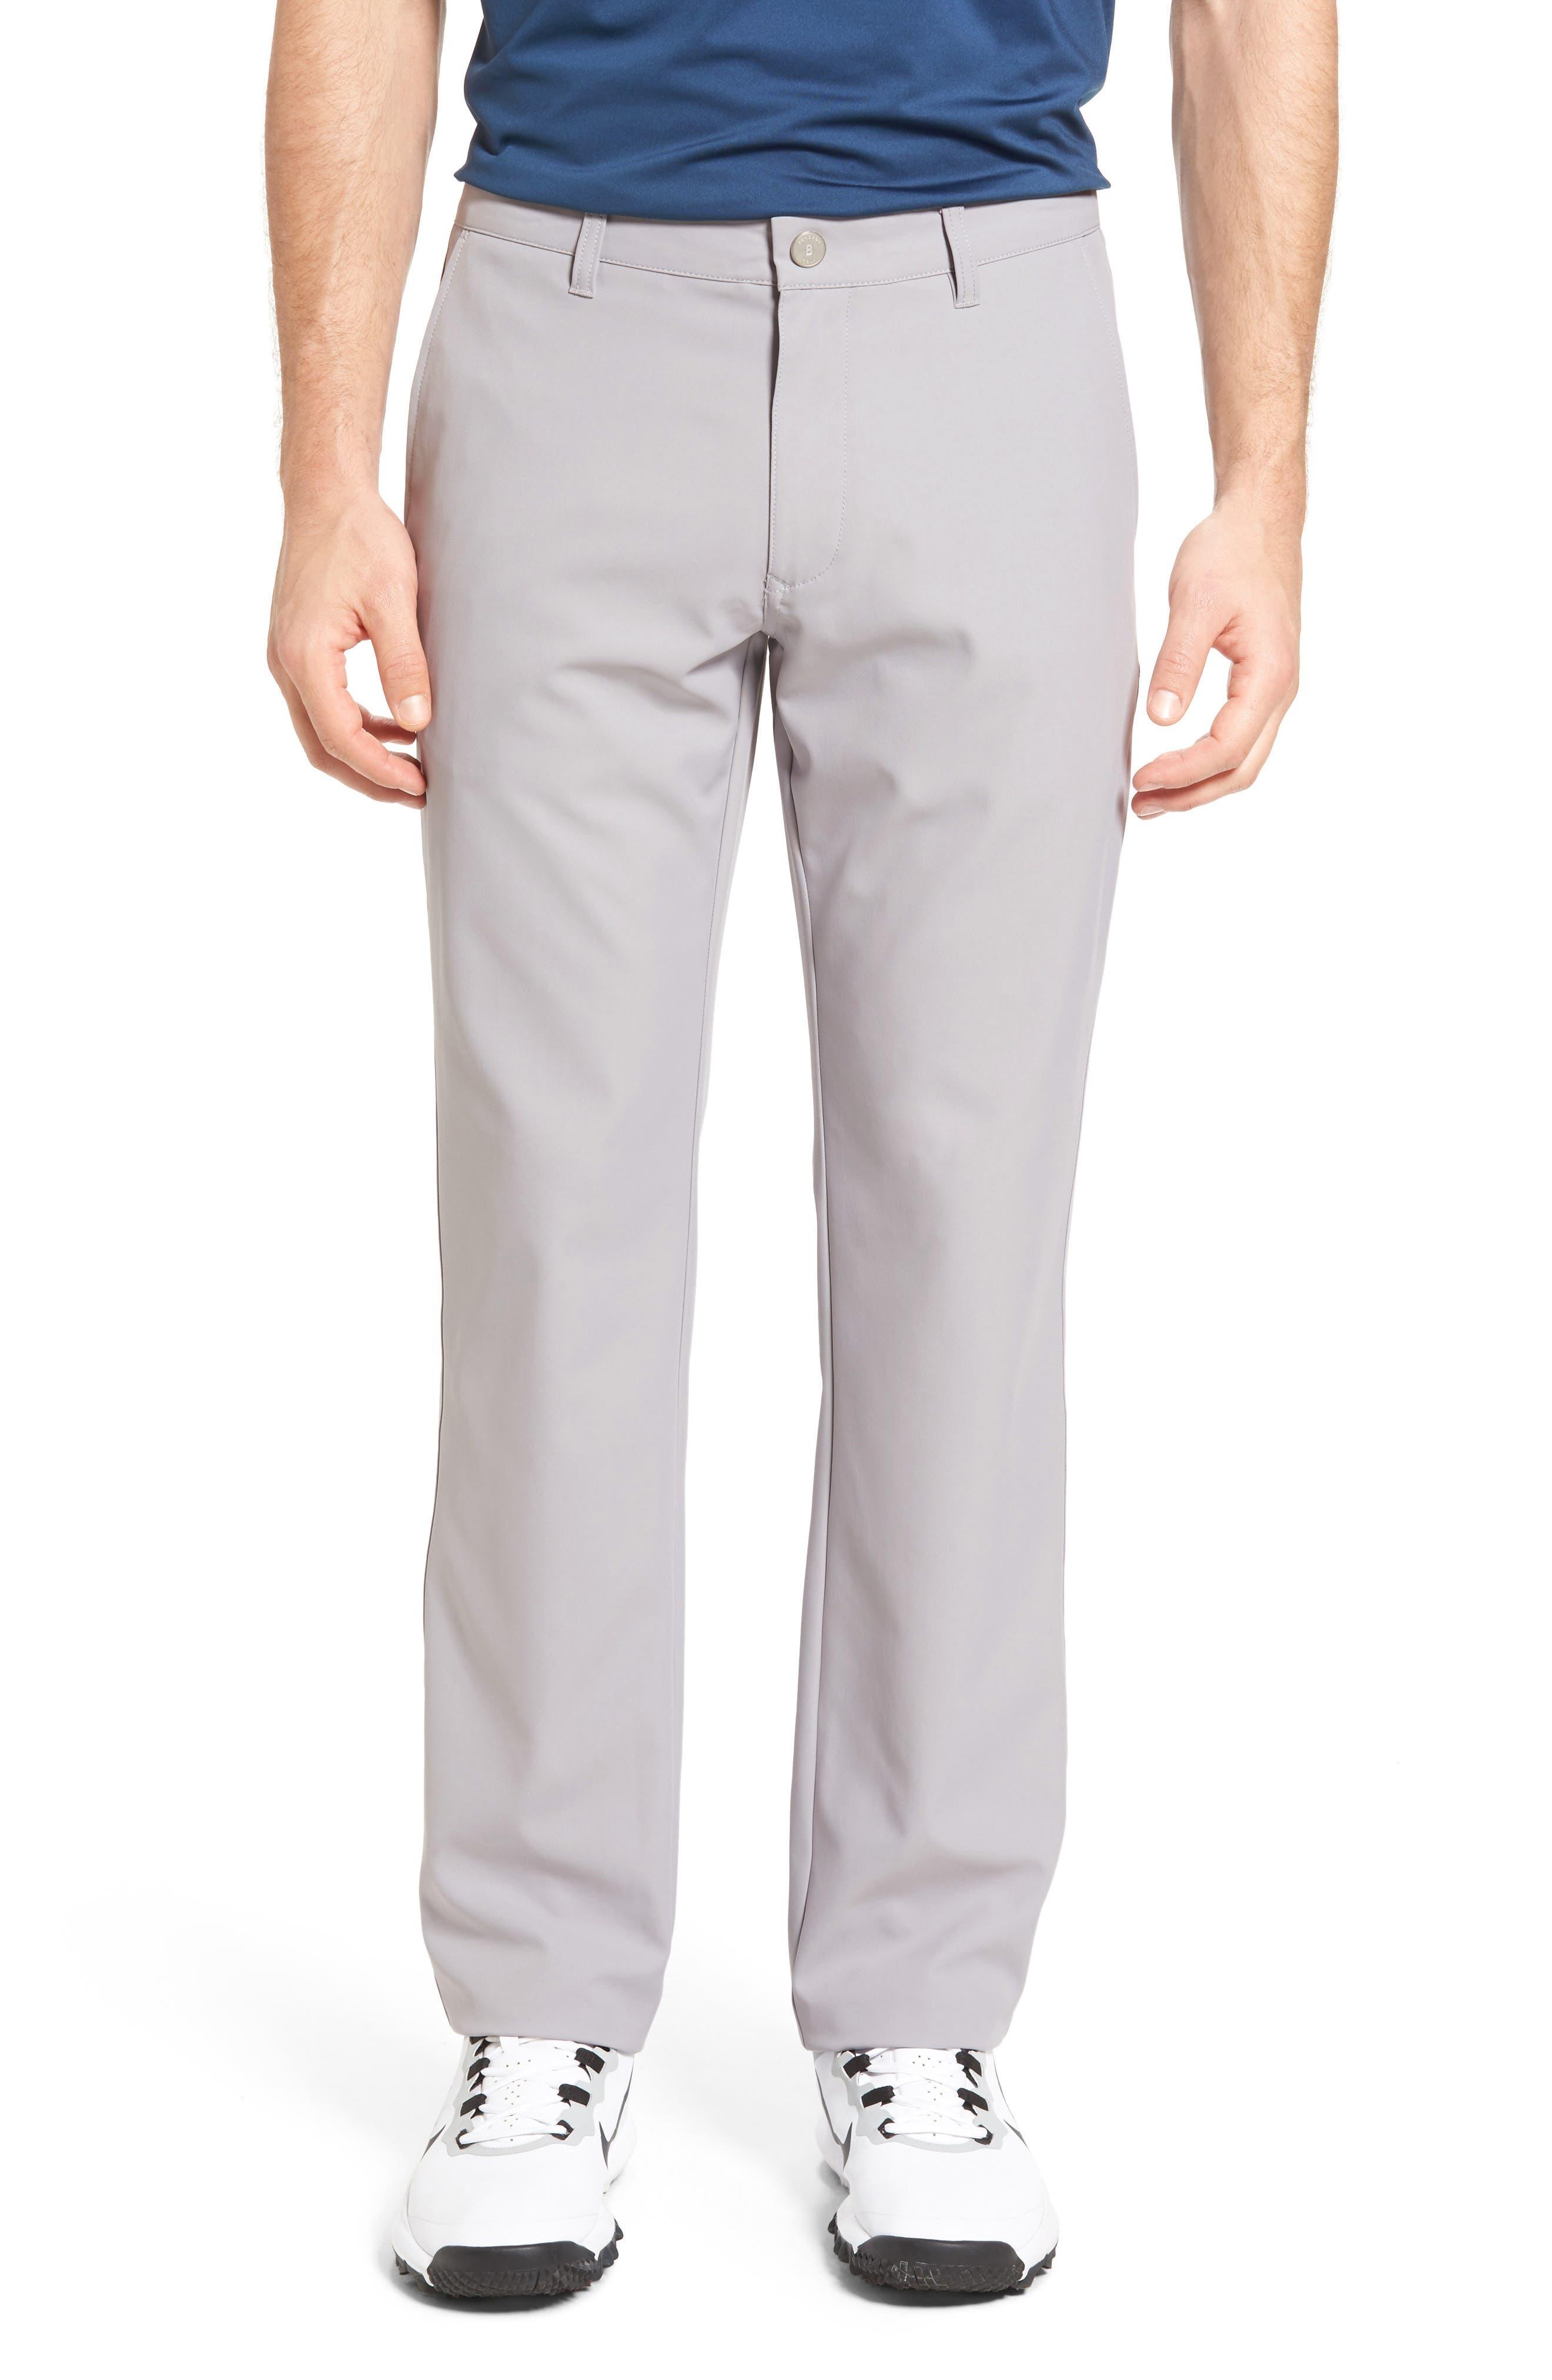 Highland Slim Fit Golf Pants,                             Main thumbnail 1, color,                             LIGHT GREY